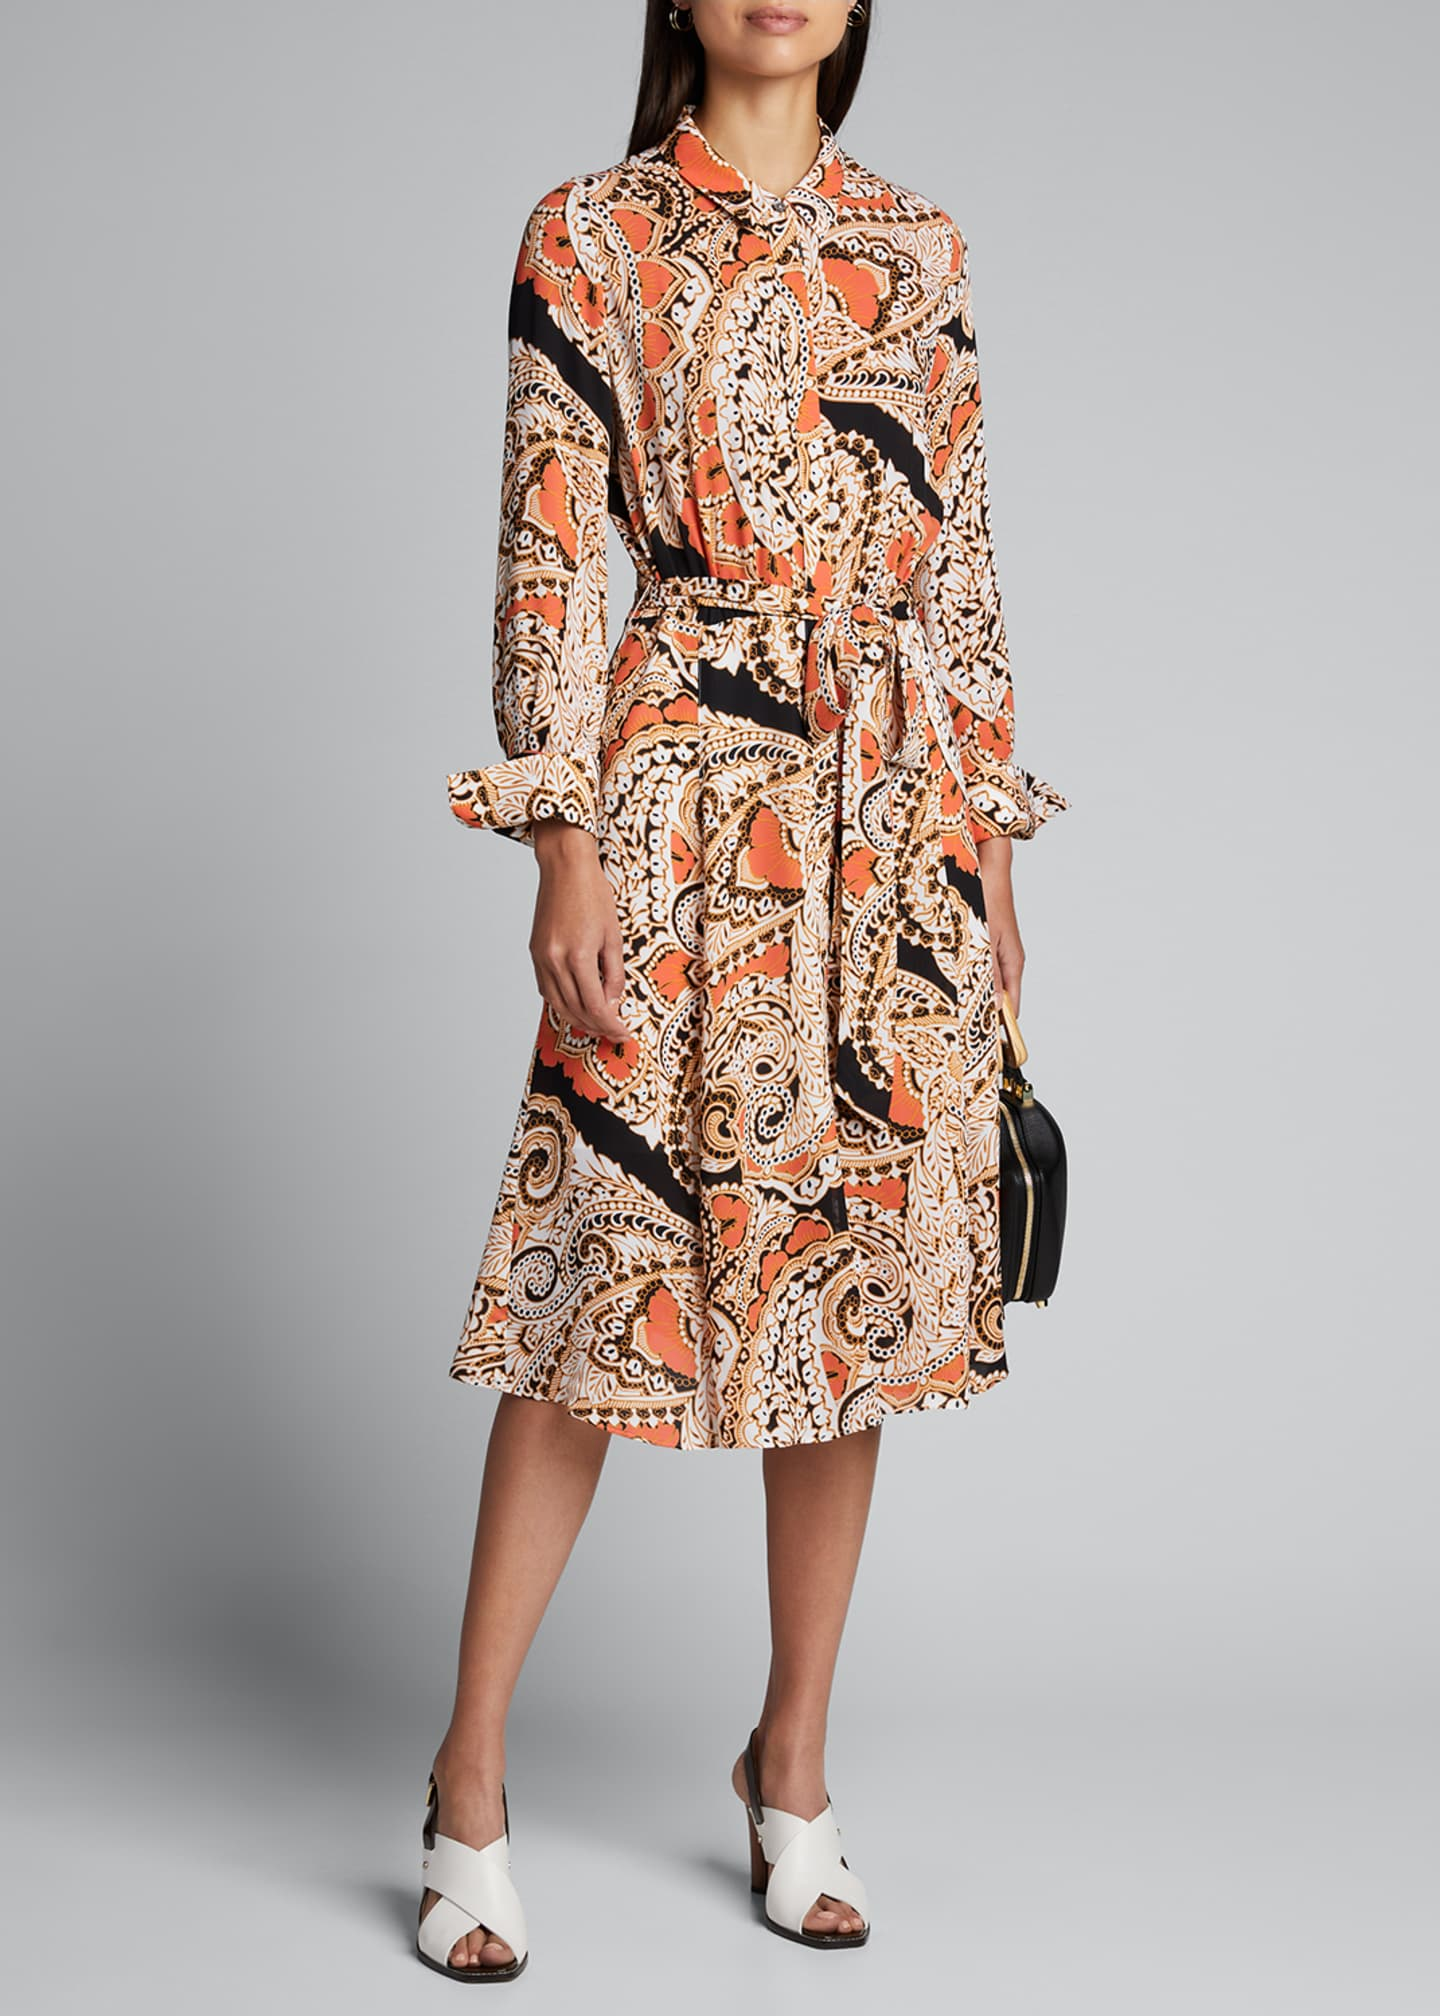 Kobi Halperin Madi Paisley Long-Sleeve Midi Dress